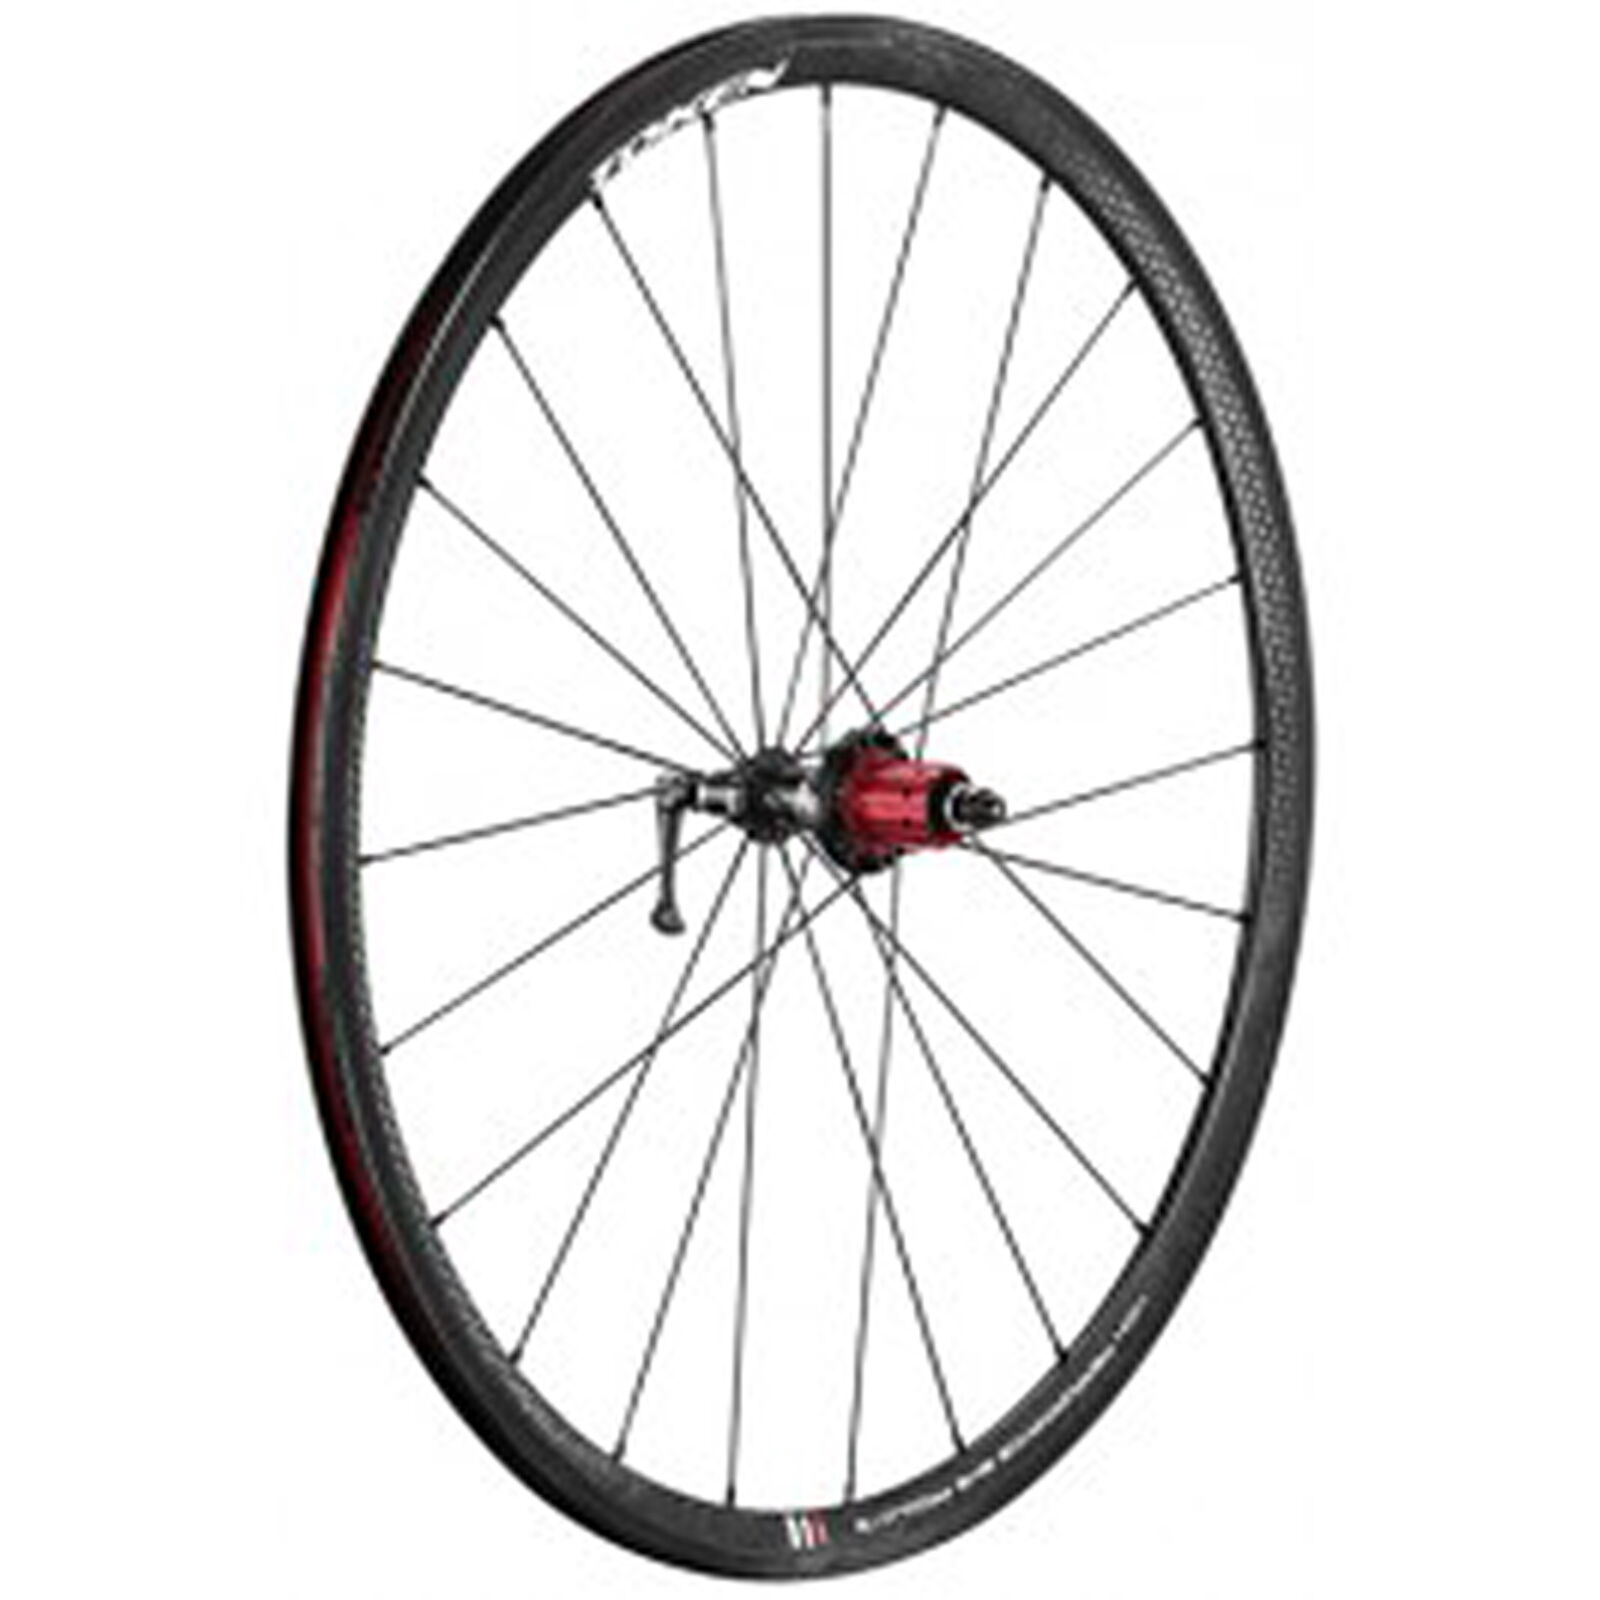 Cyclecross bici da corsa  Set ruote bicicletta GETTONI   c28ad   28 pollici per  cheap store